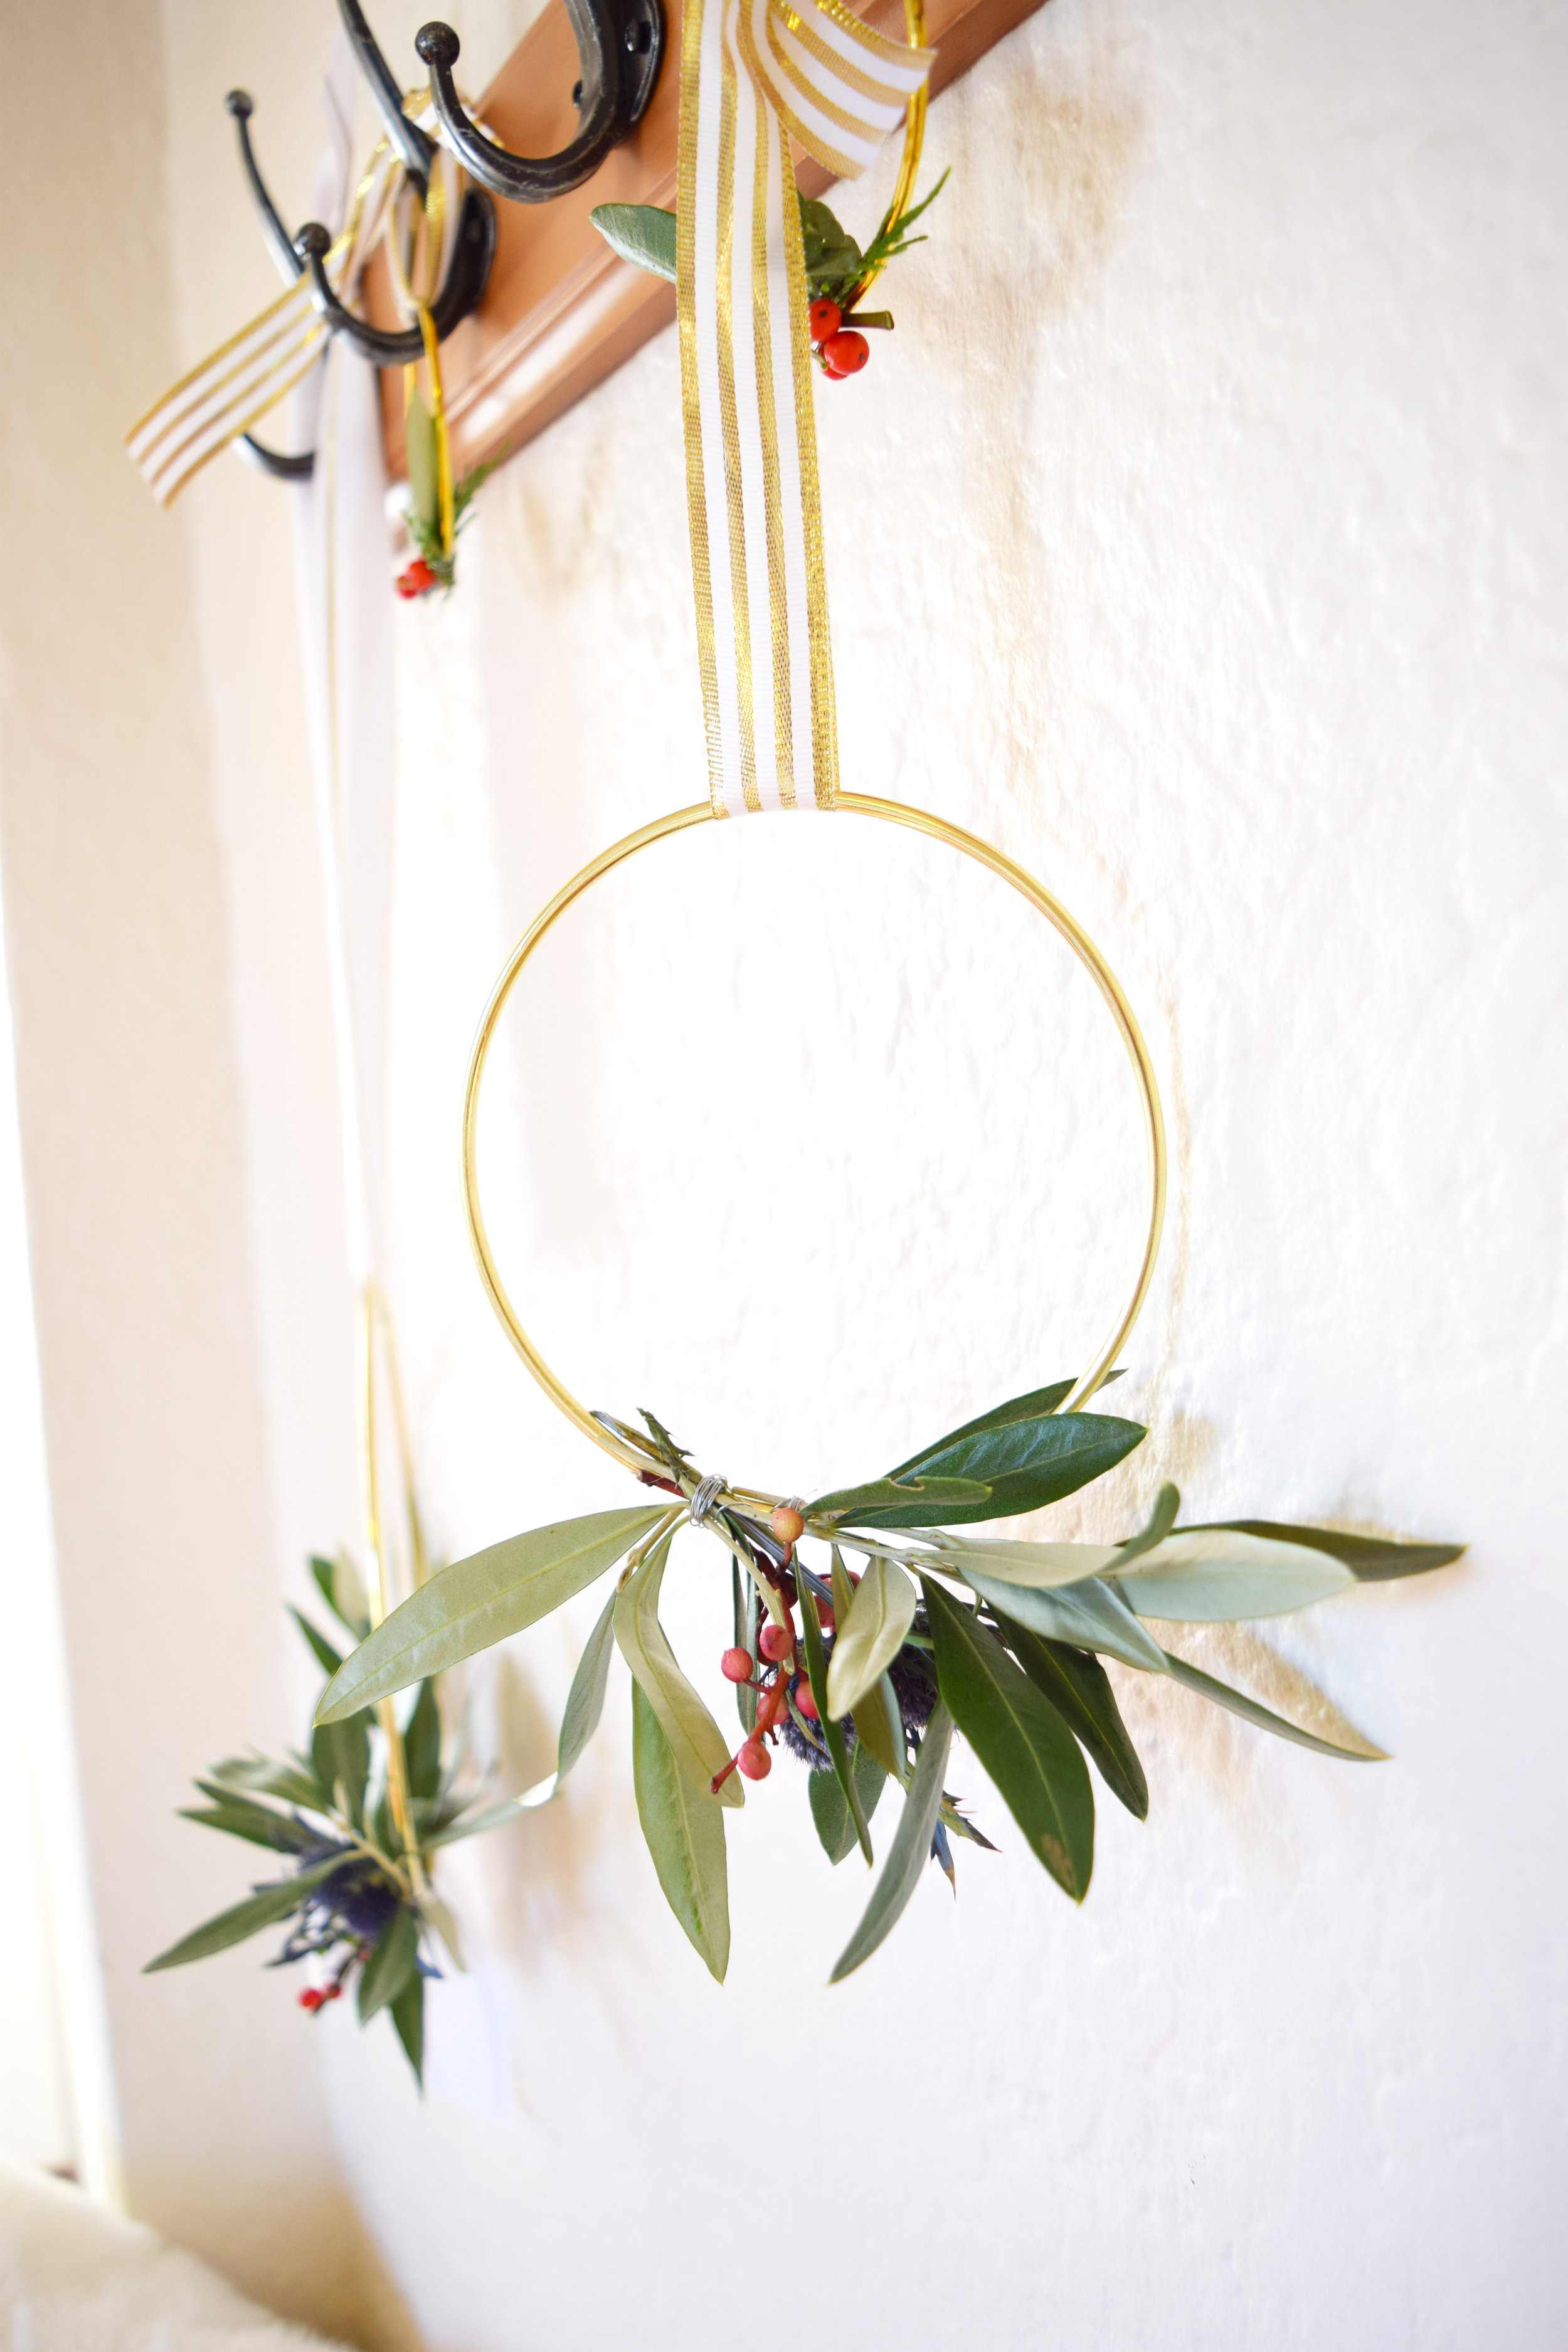 diy_holiday_wreath_5.jpg